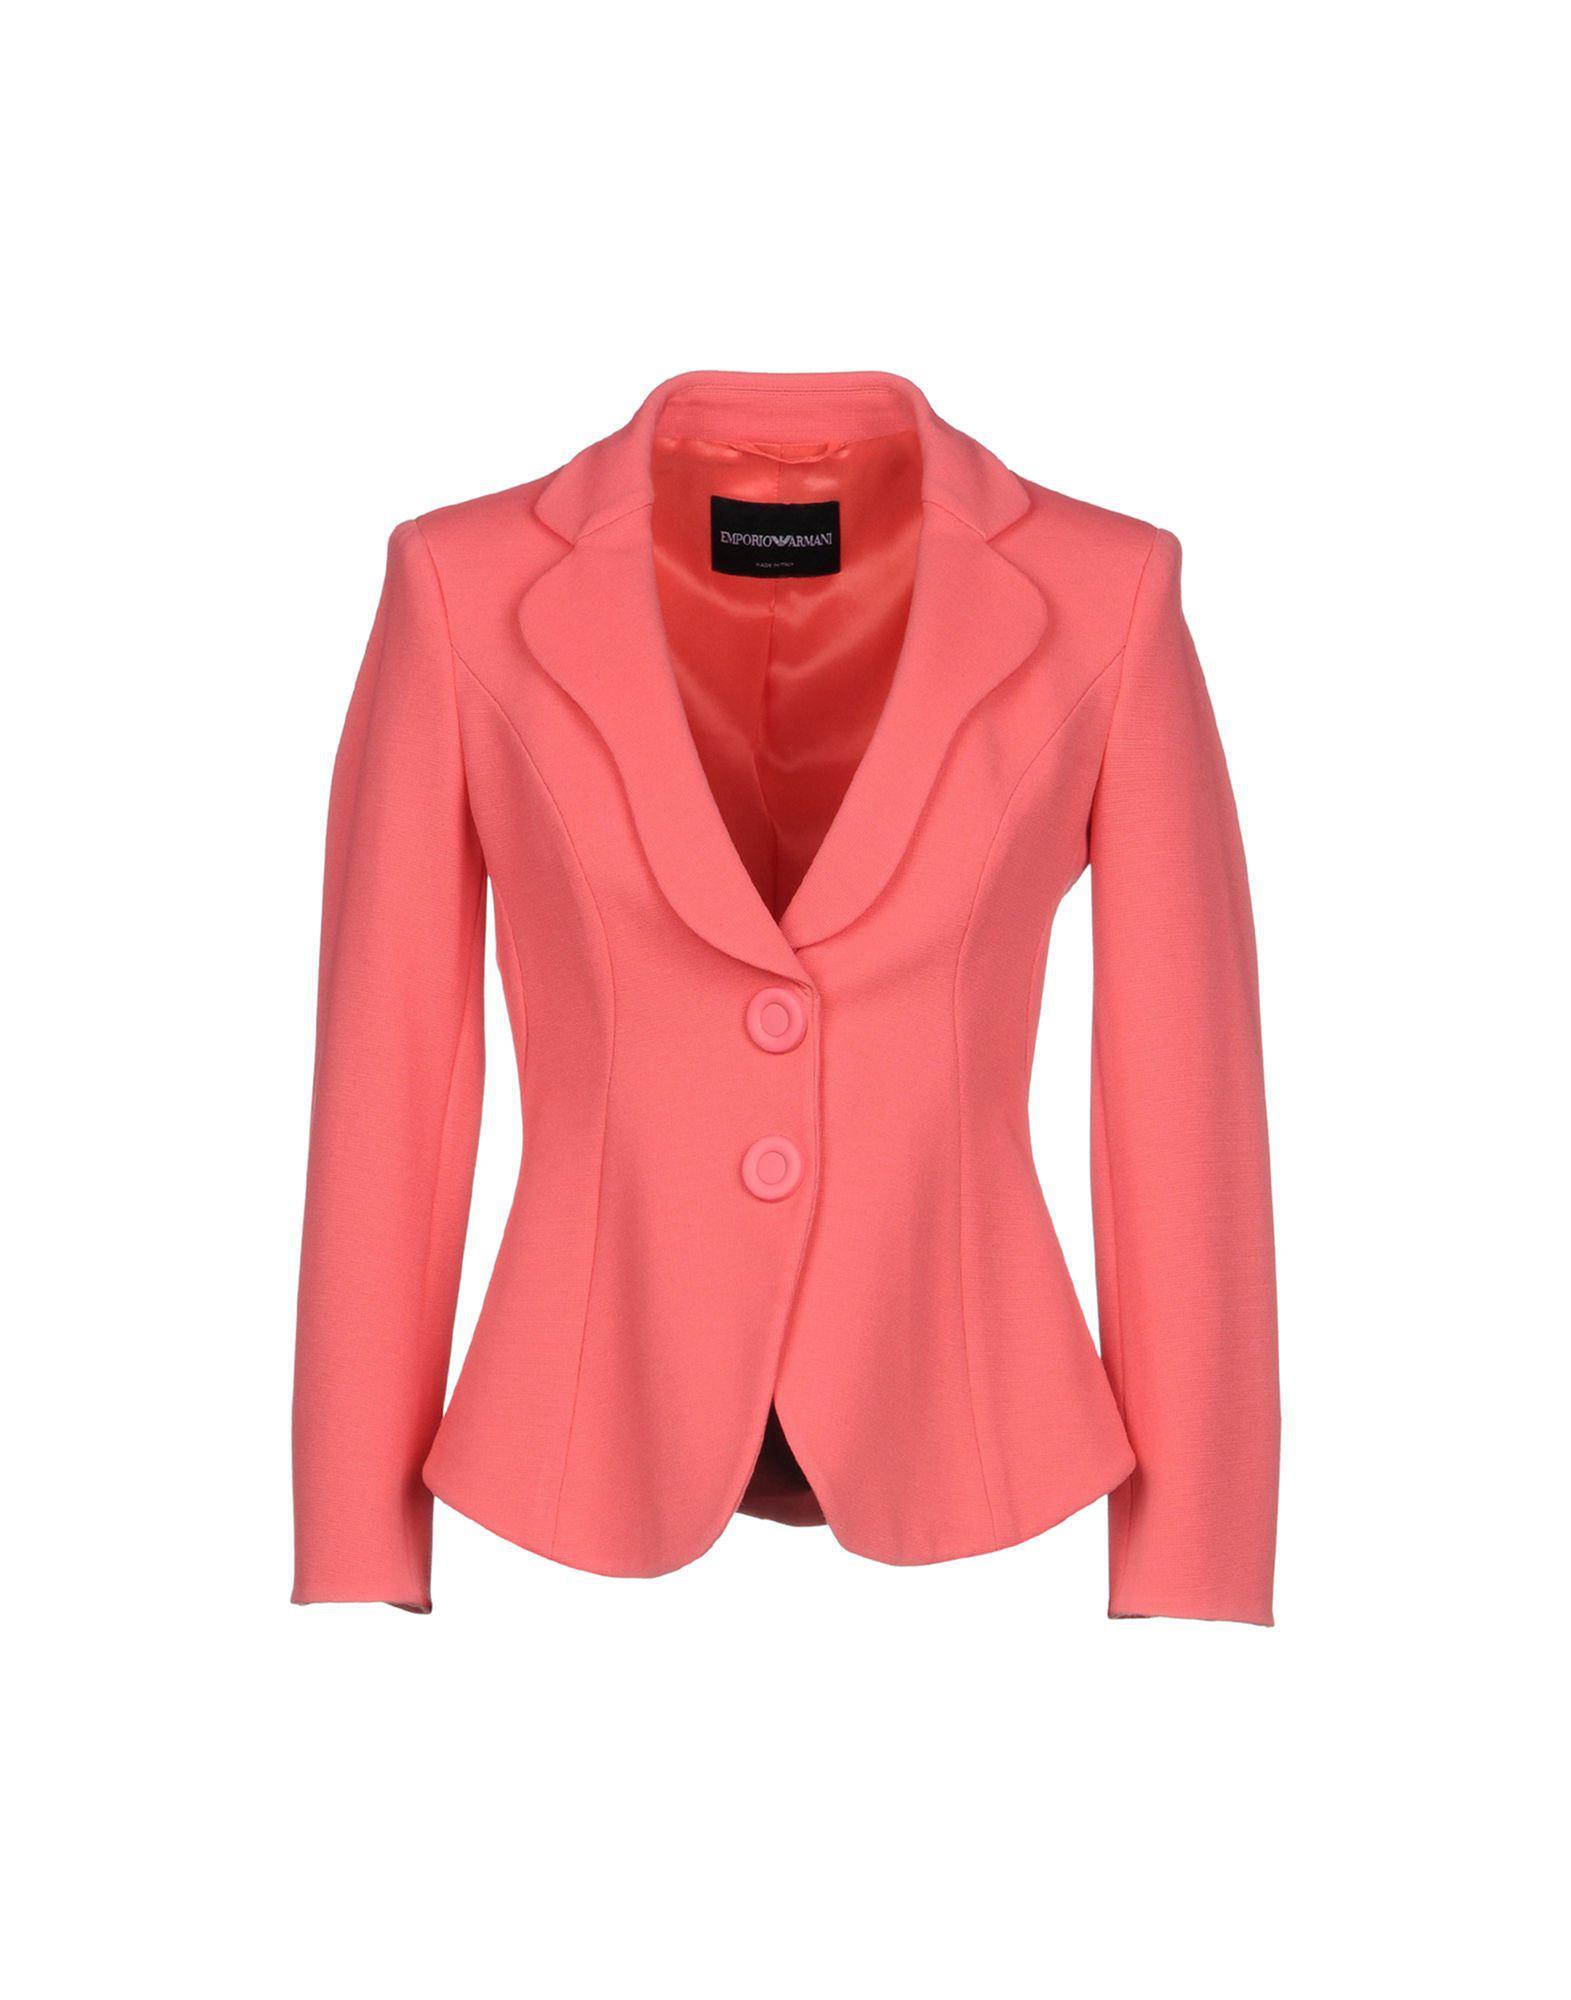 Pink Armani Lyst Emporio Blazer In q14YwYF